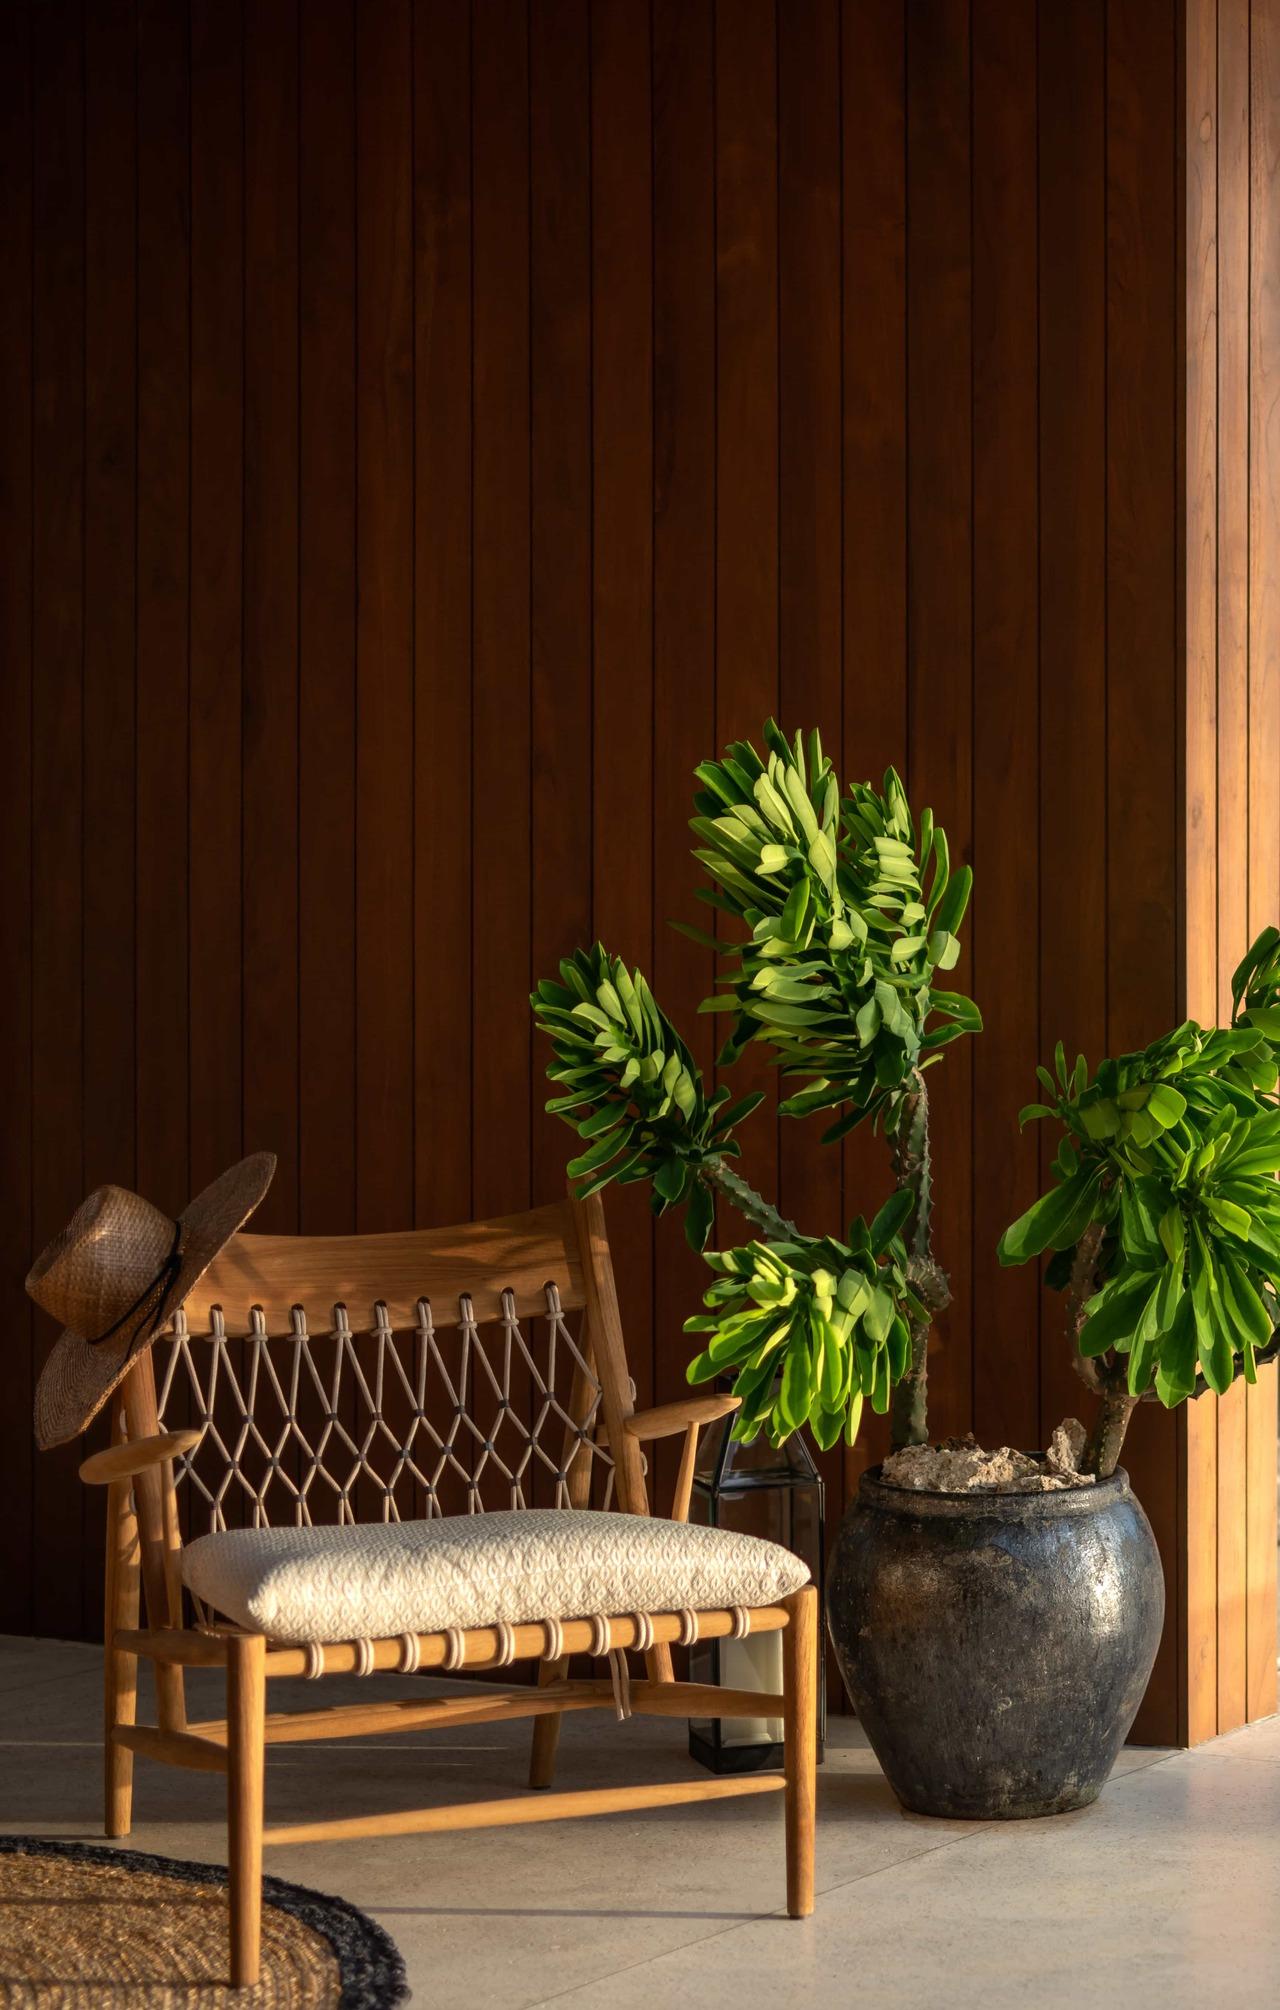 CapKaroso-ropeandwood-loungechair-plant